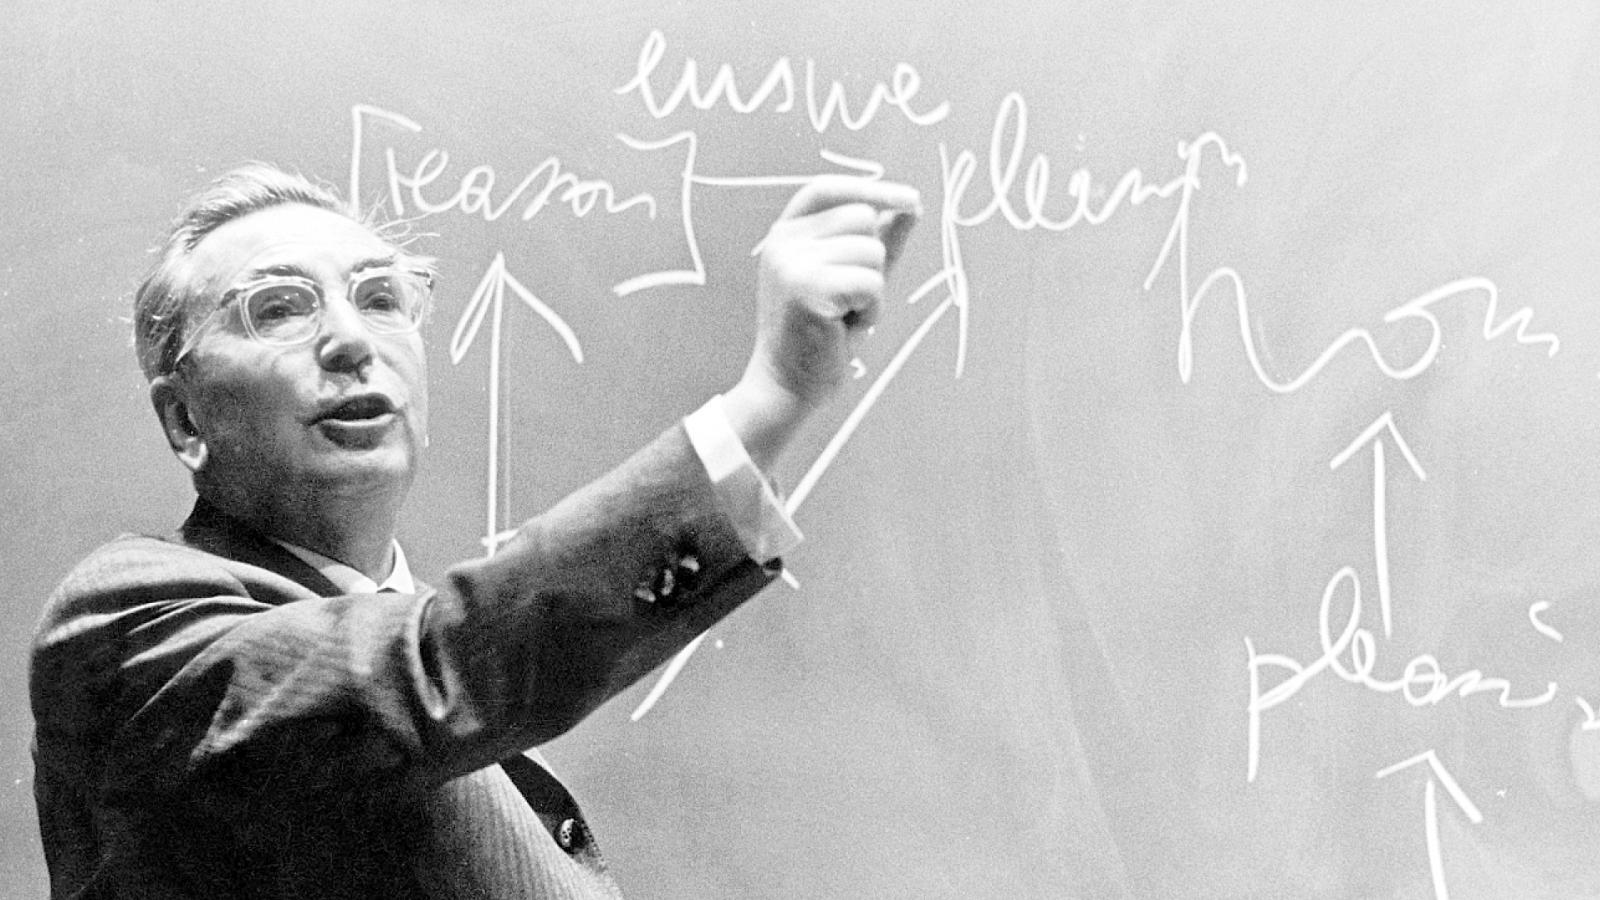 Viktor Frankl Image: Austria-Forum